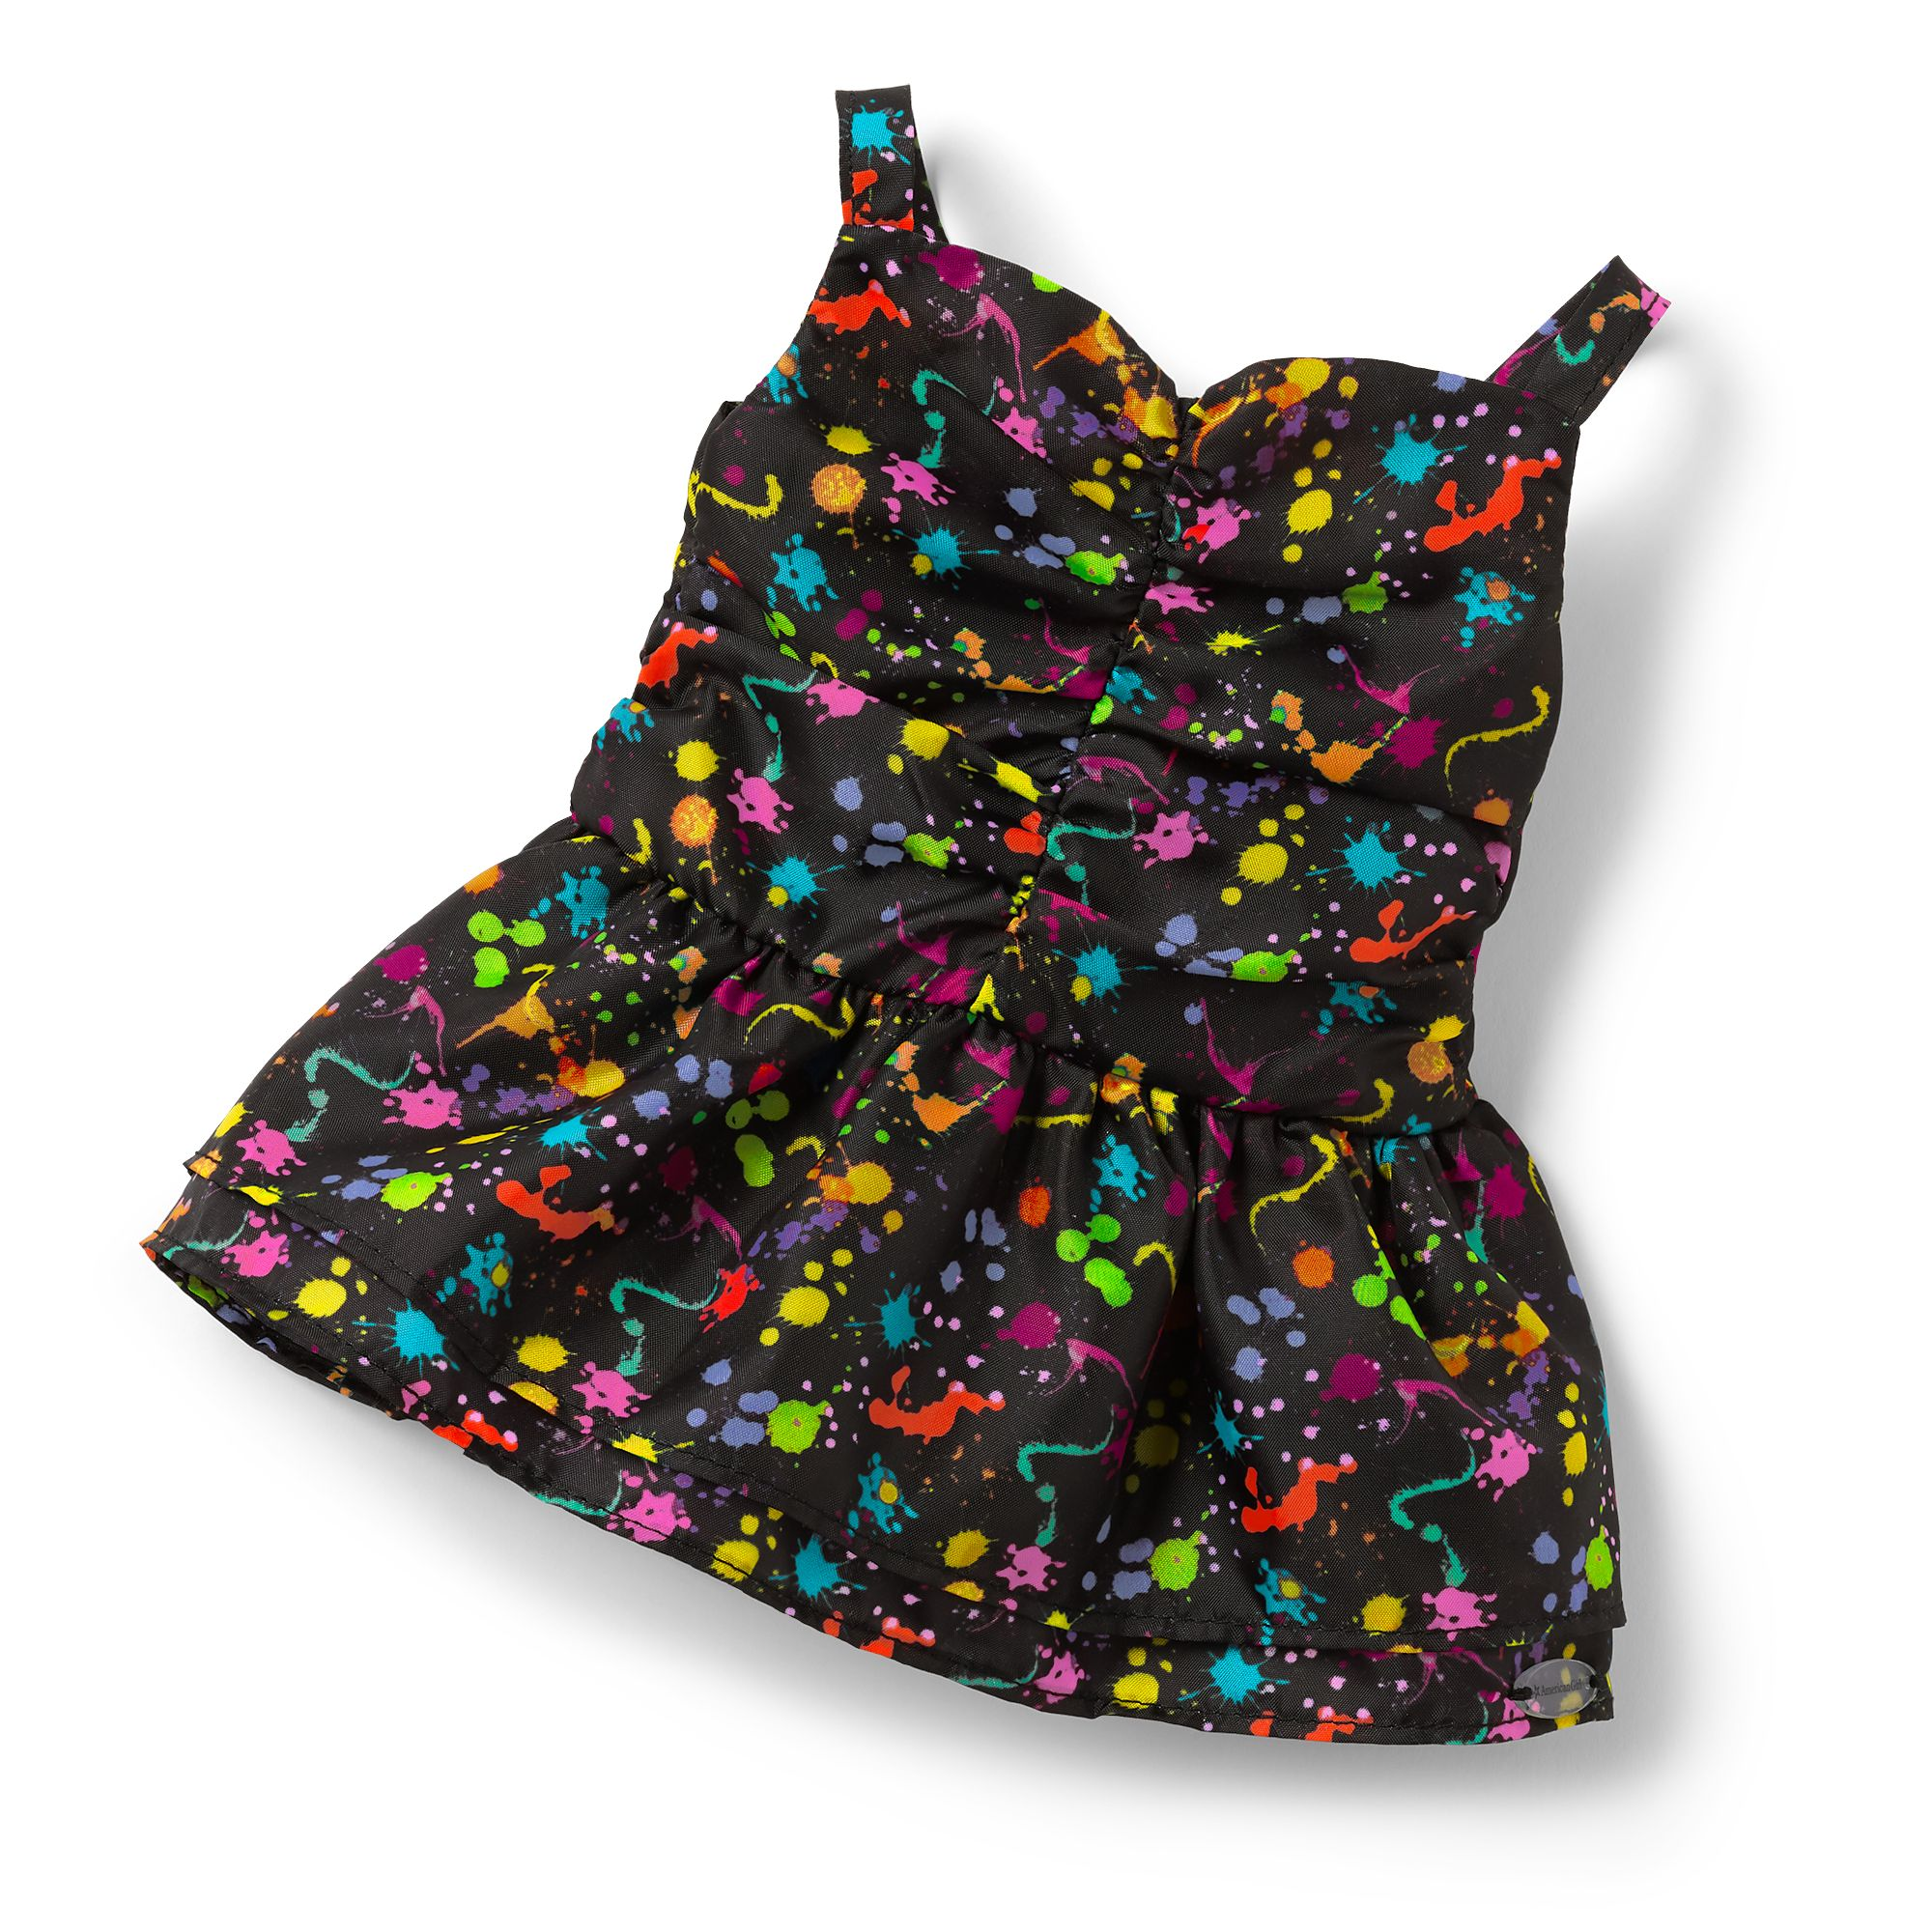 Courtney's Splatter Print Dress